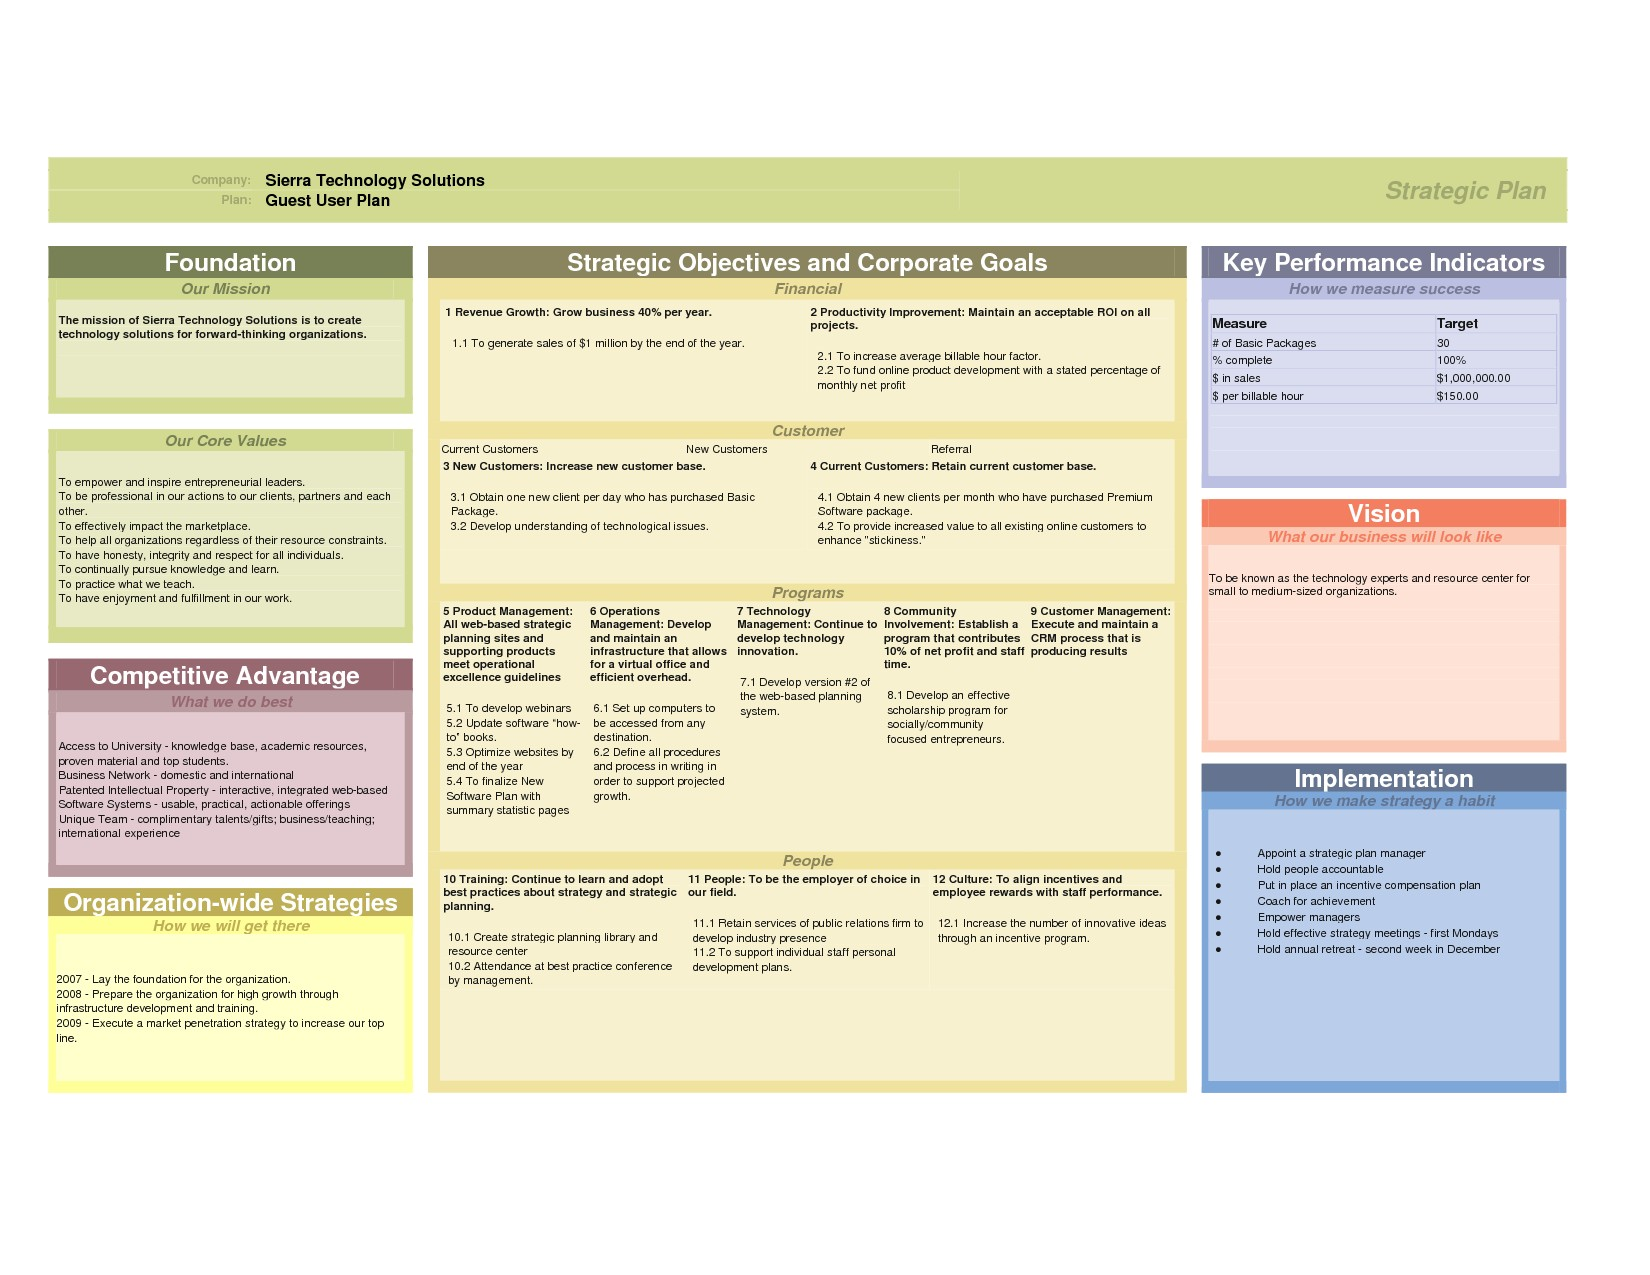 action plan hr and competitive advantage pdf